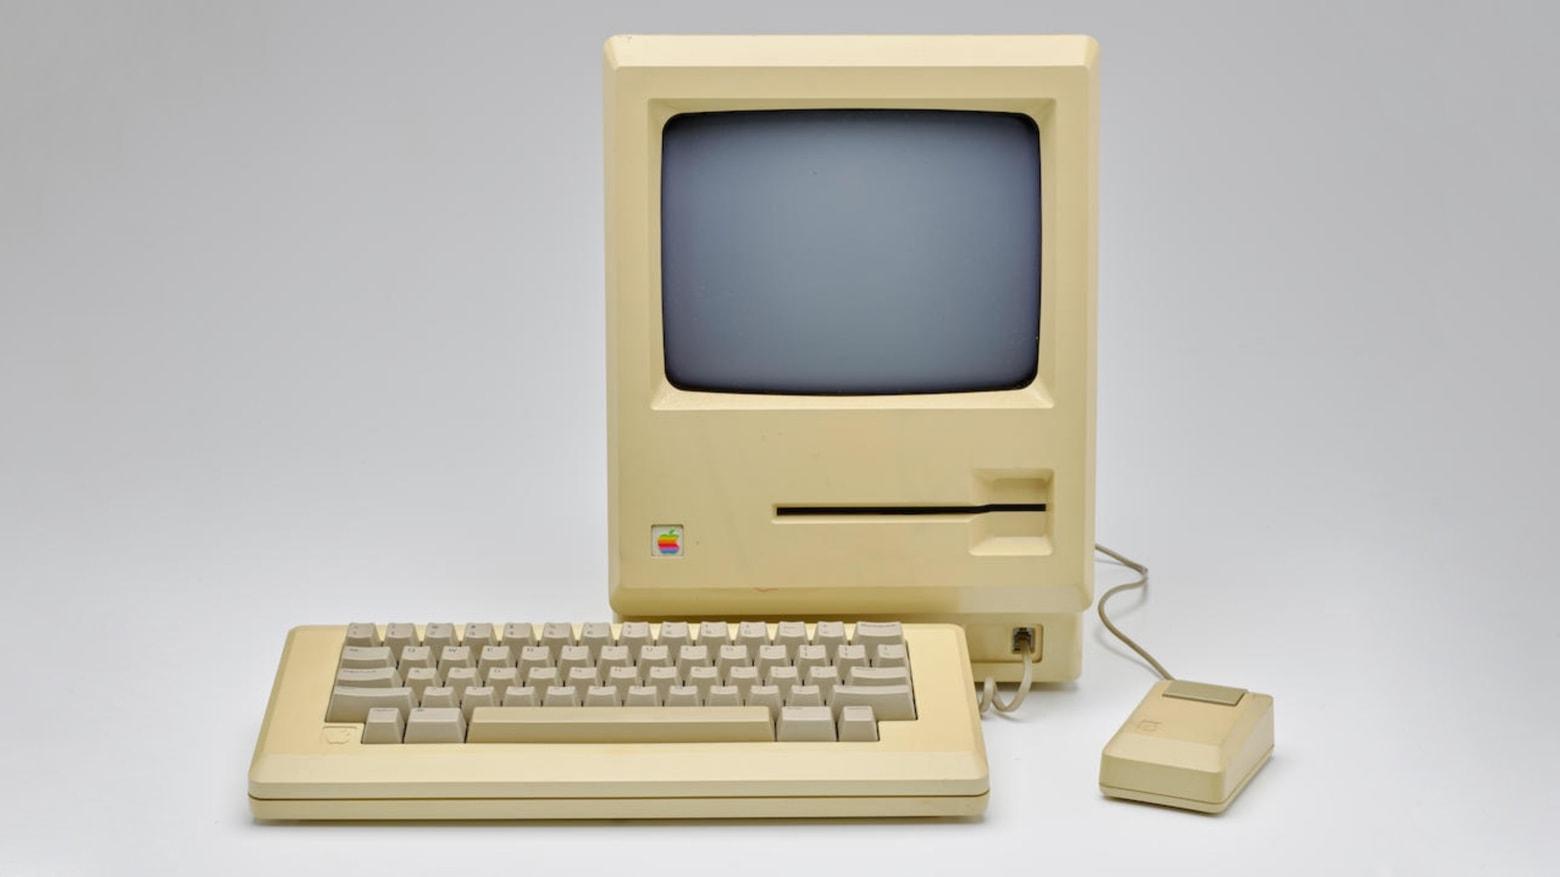 Apple Macintosh prototype with 5.25-inch drive